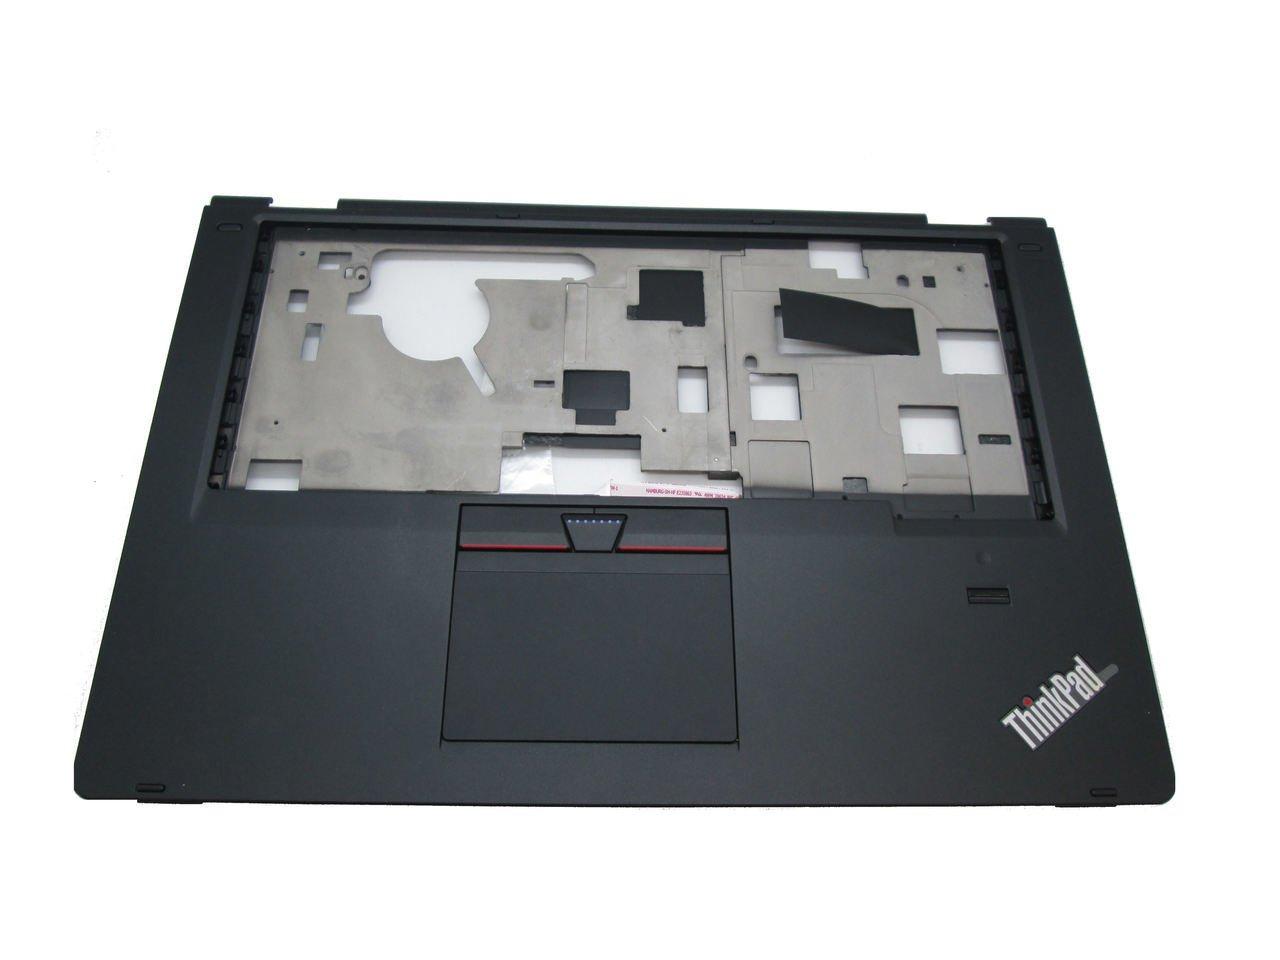 New Genuine Palmrest TouchPad For Lenovo Thinkpad Yoga P40 460 Yoga 14 Palmrest TouchPad With FPR 01AW395